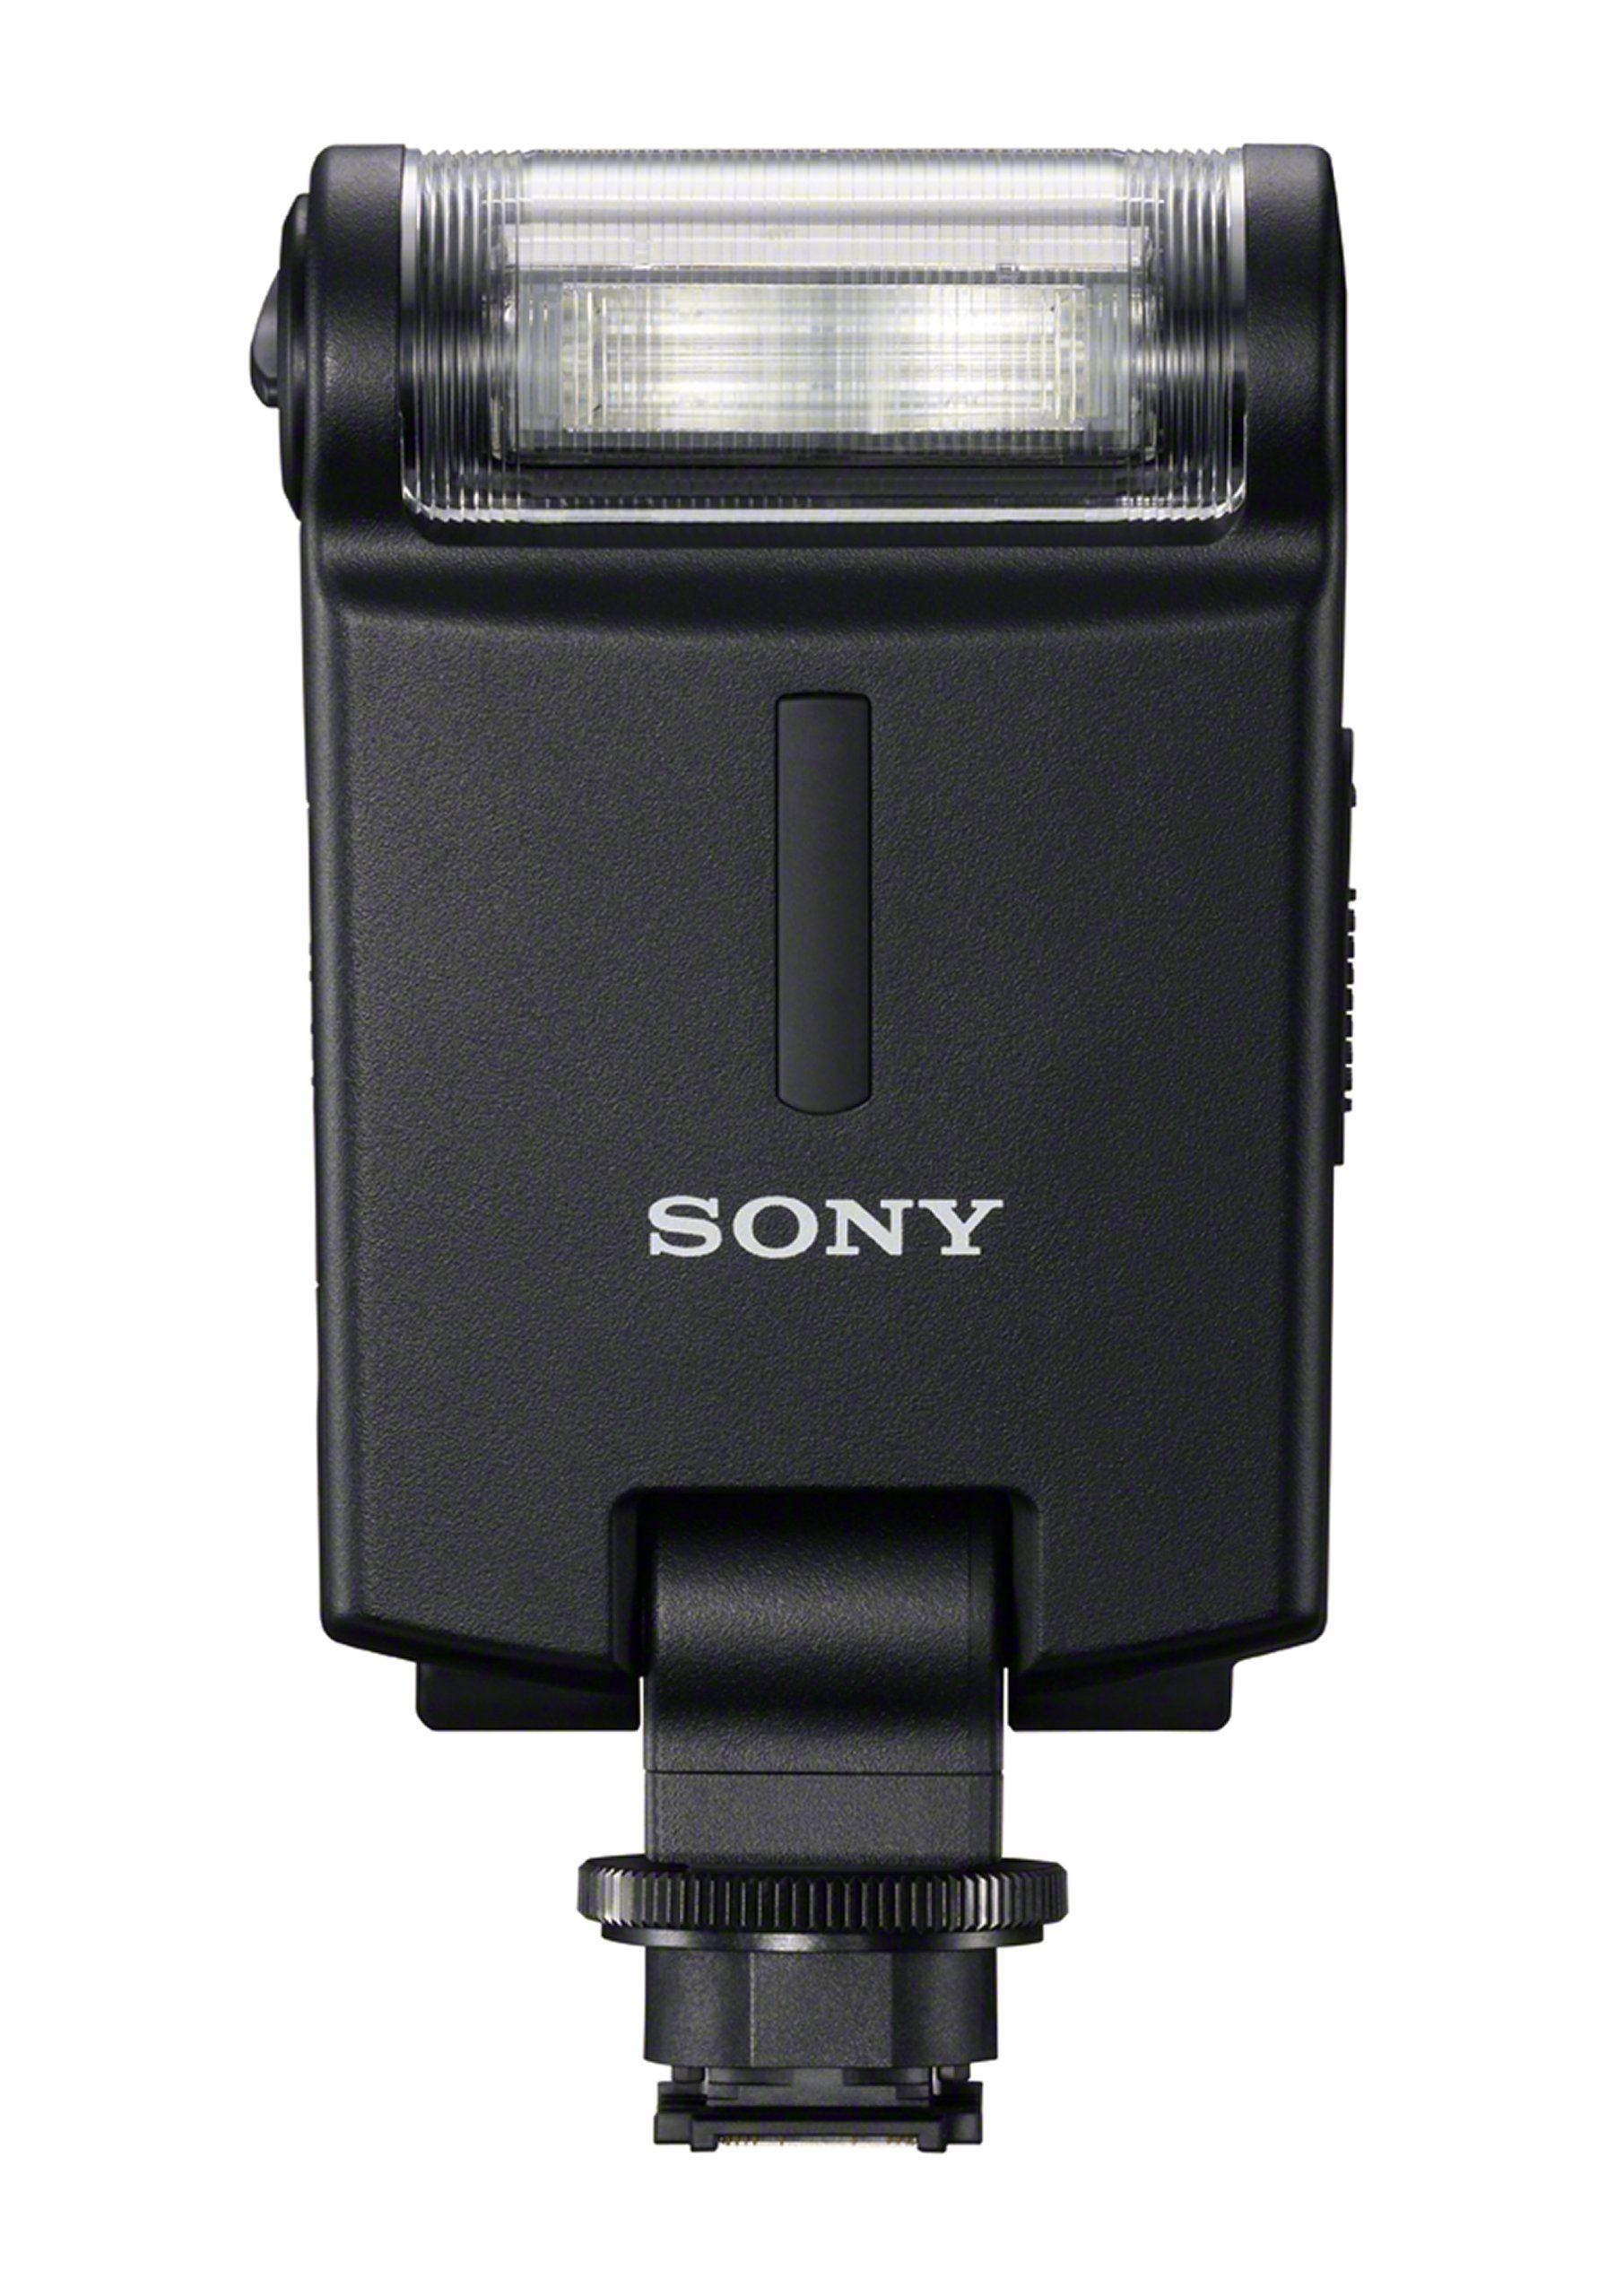 Sony HVLF20M, MI Shoe External Flash for Alpha SLT/NEX (Black)